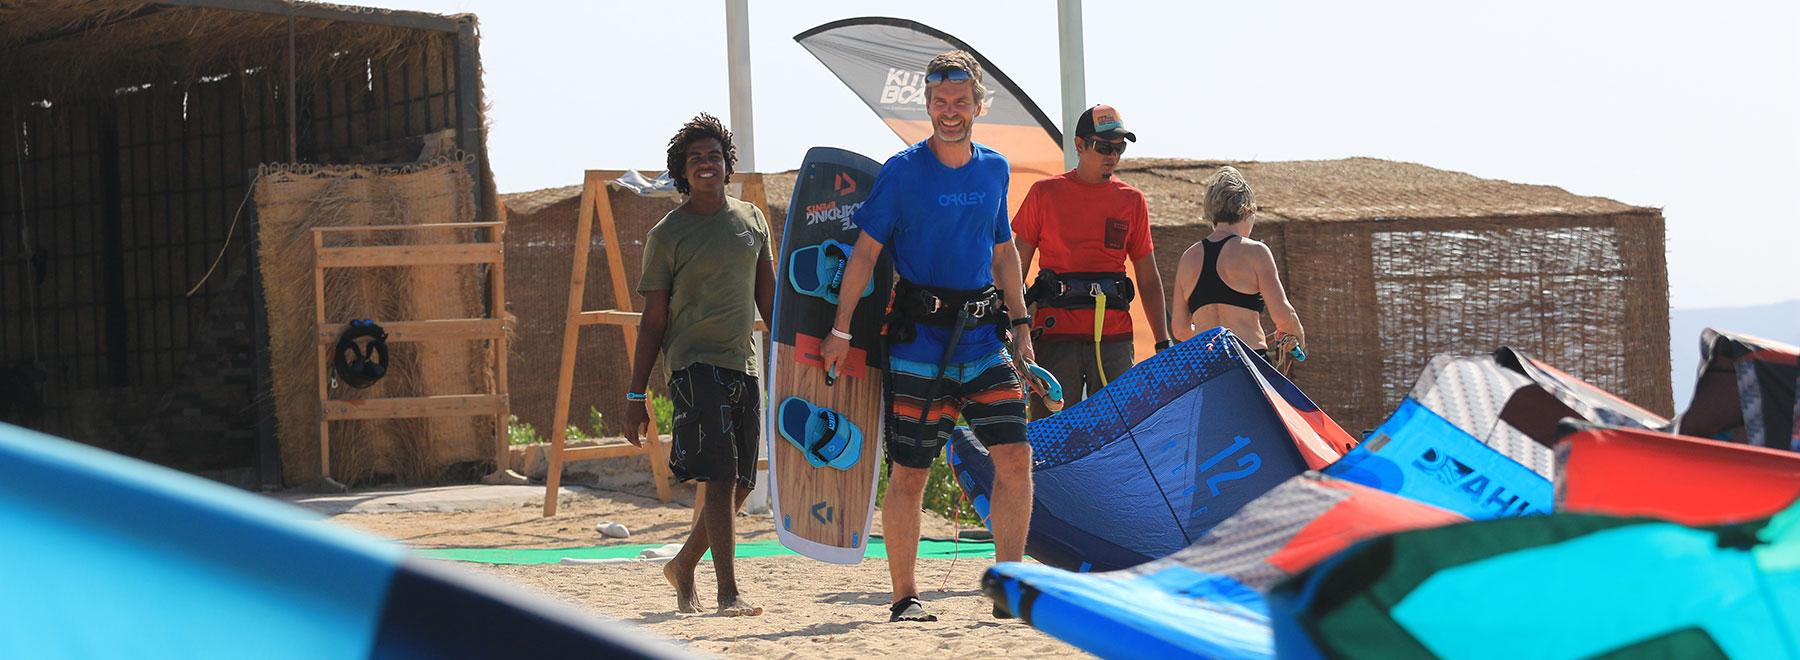 Kiteboarding-Events-El-Gouna, Makani Beach